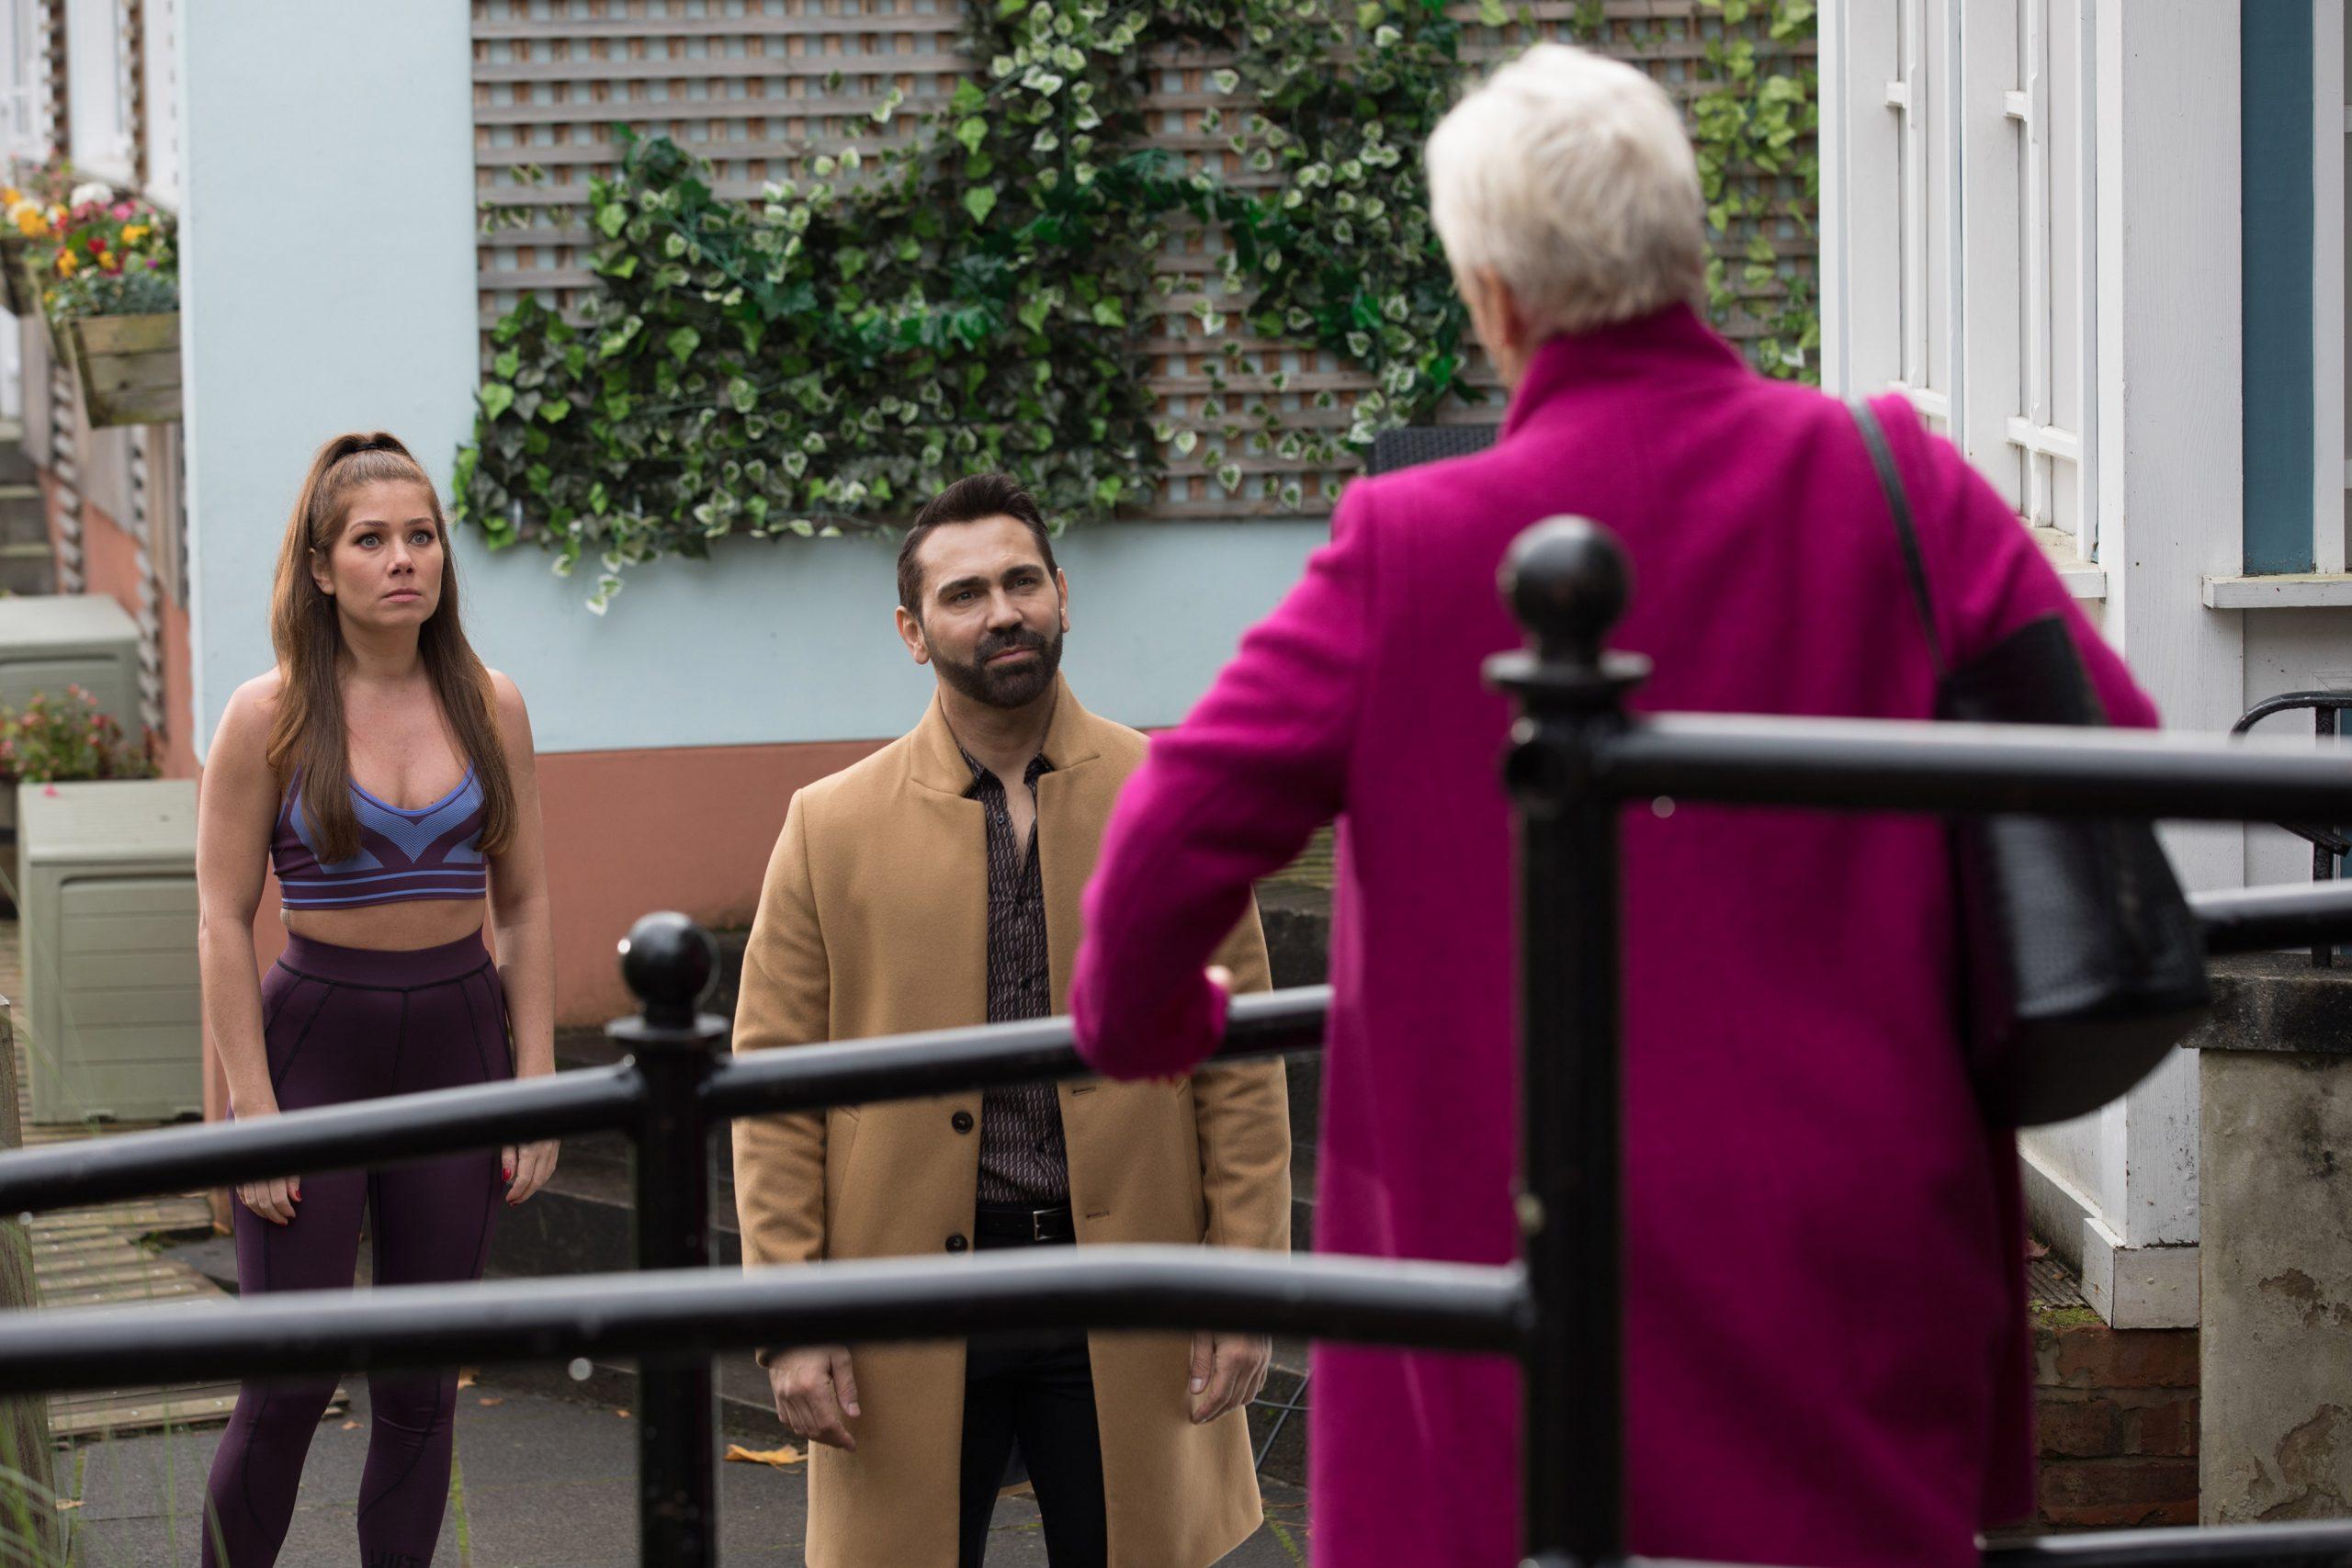 Semana 3 Trish Minniver interpretada por Denise Welch en Hollyoaks